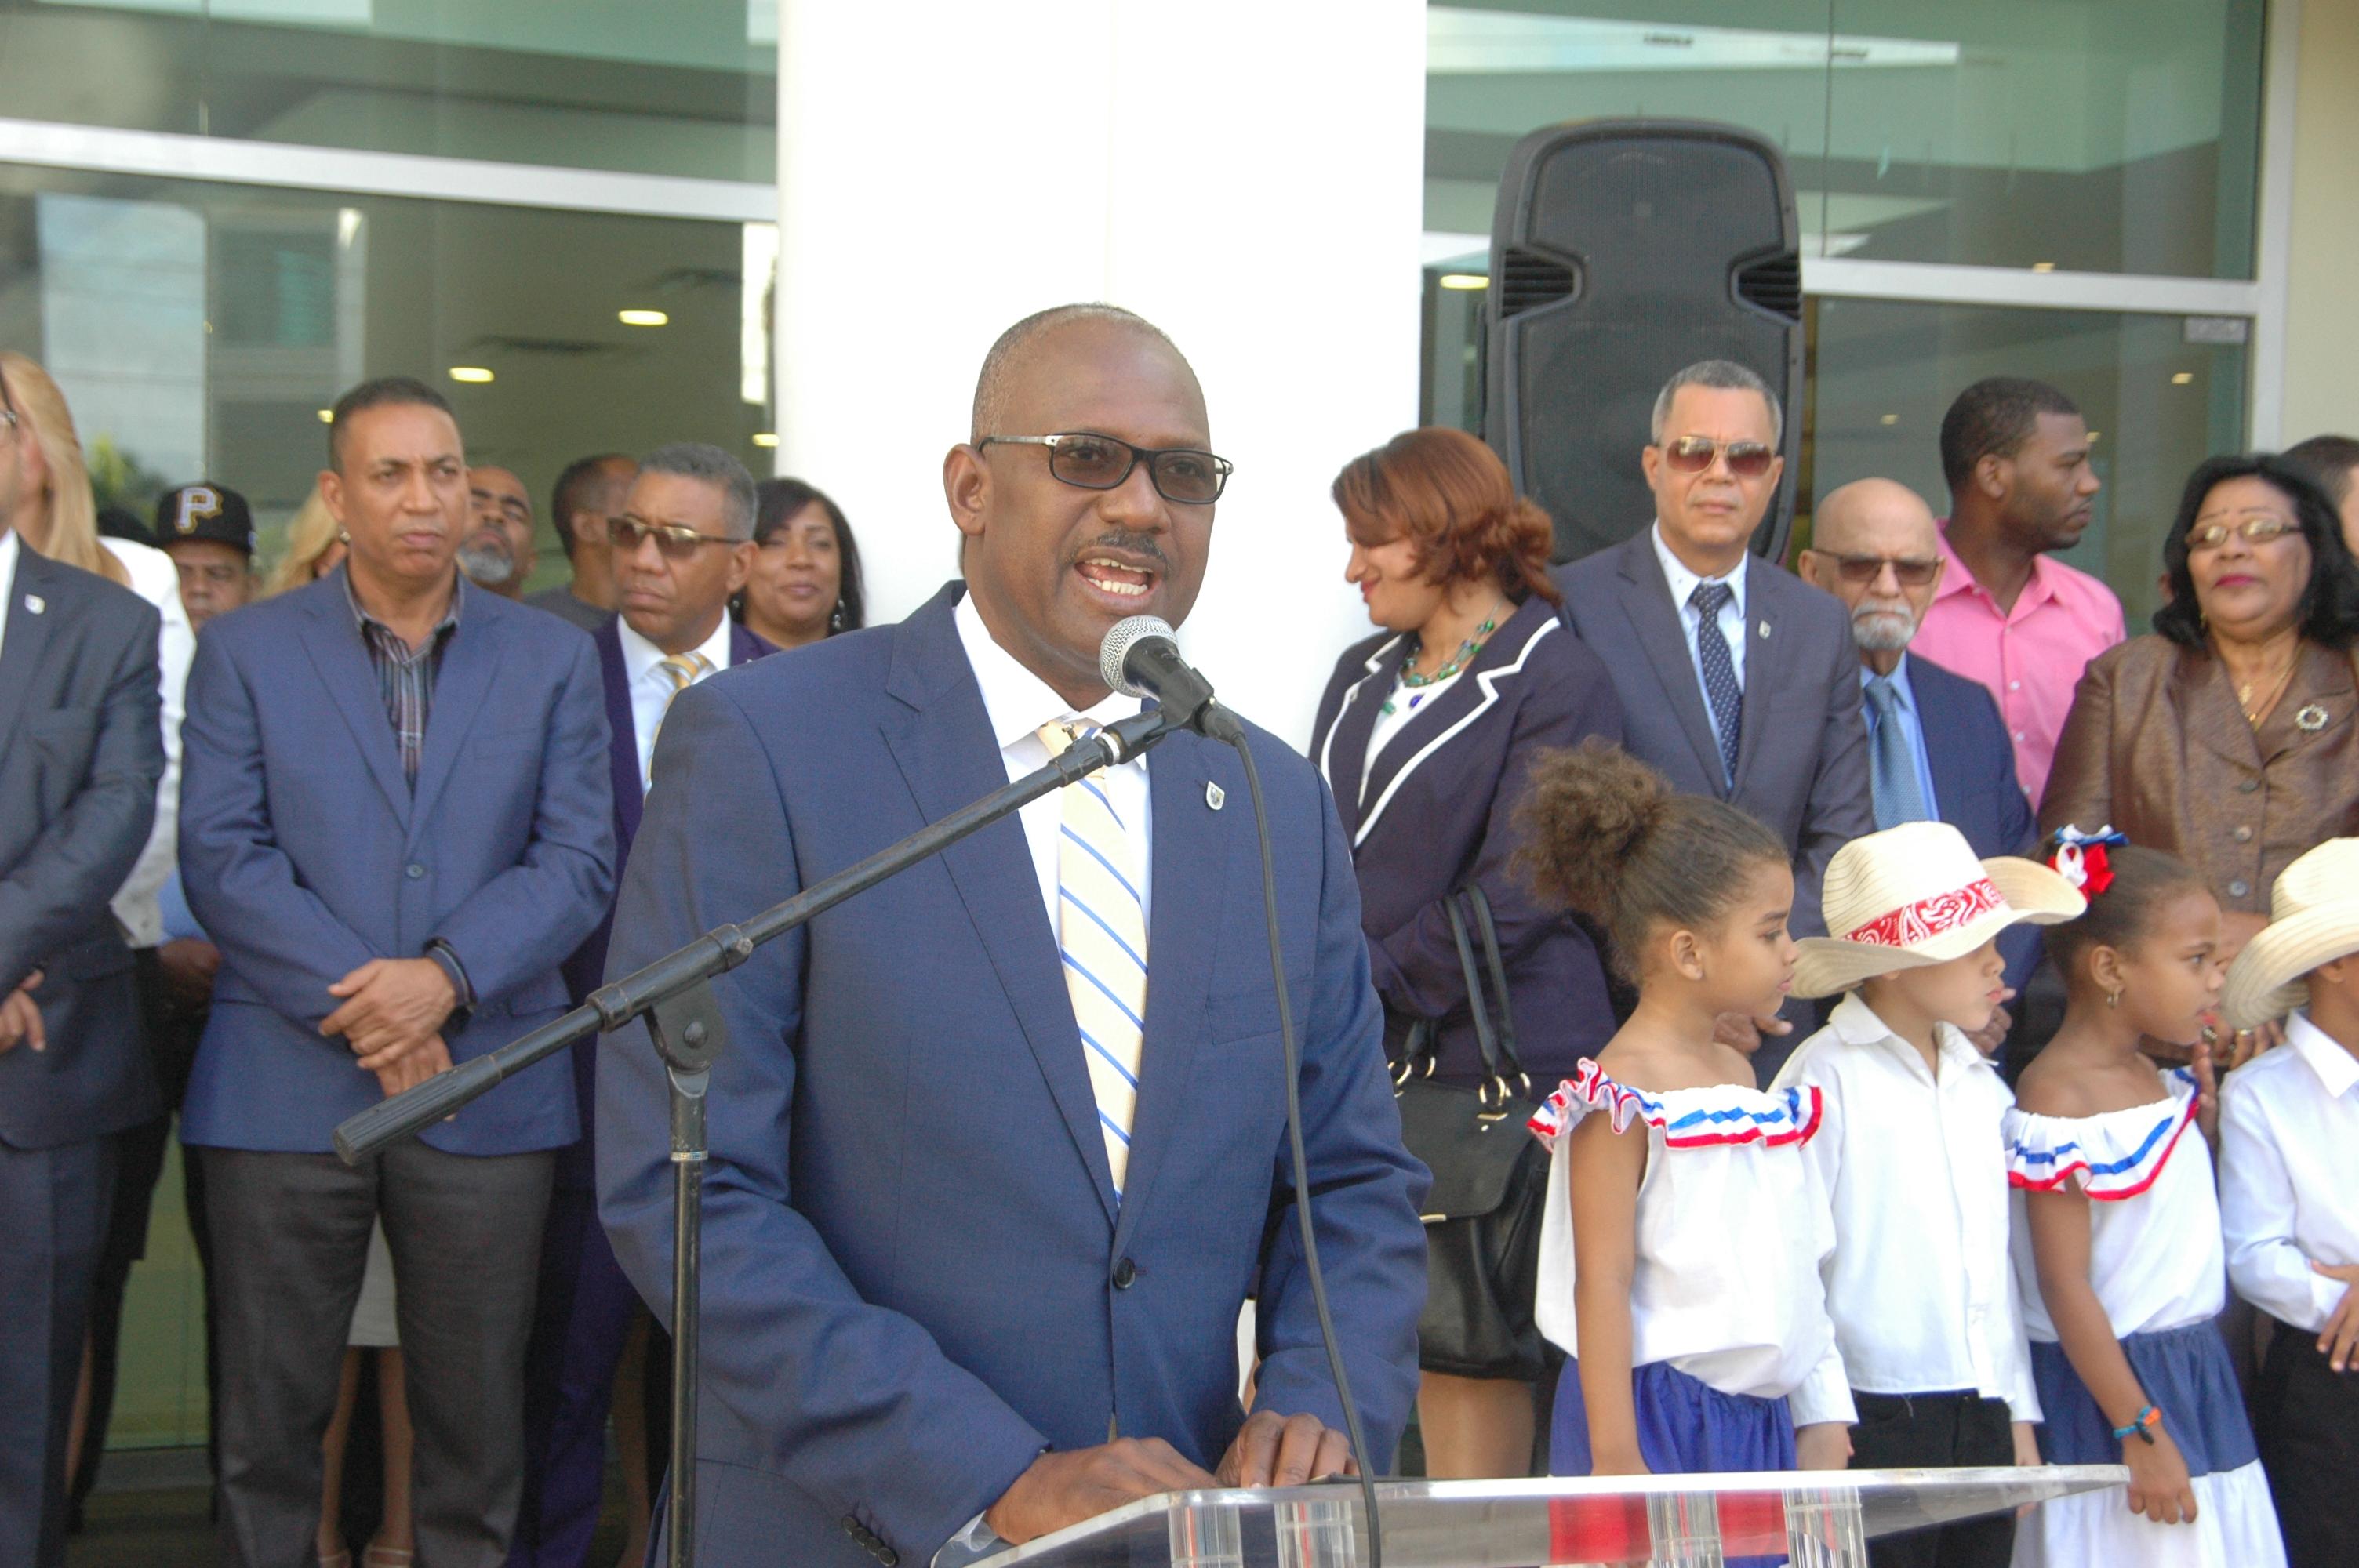 , Alcalde Alfredo Martínez aboga por modificación de ley que rige los cabildos